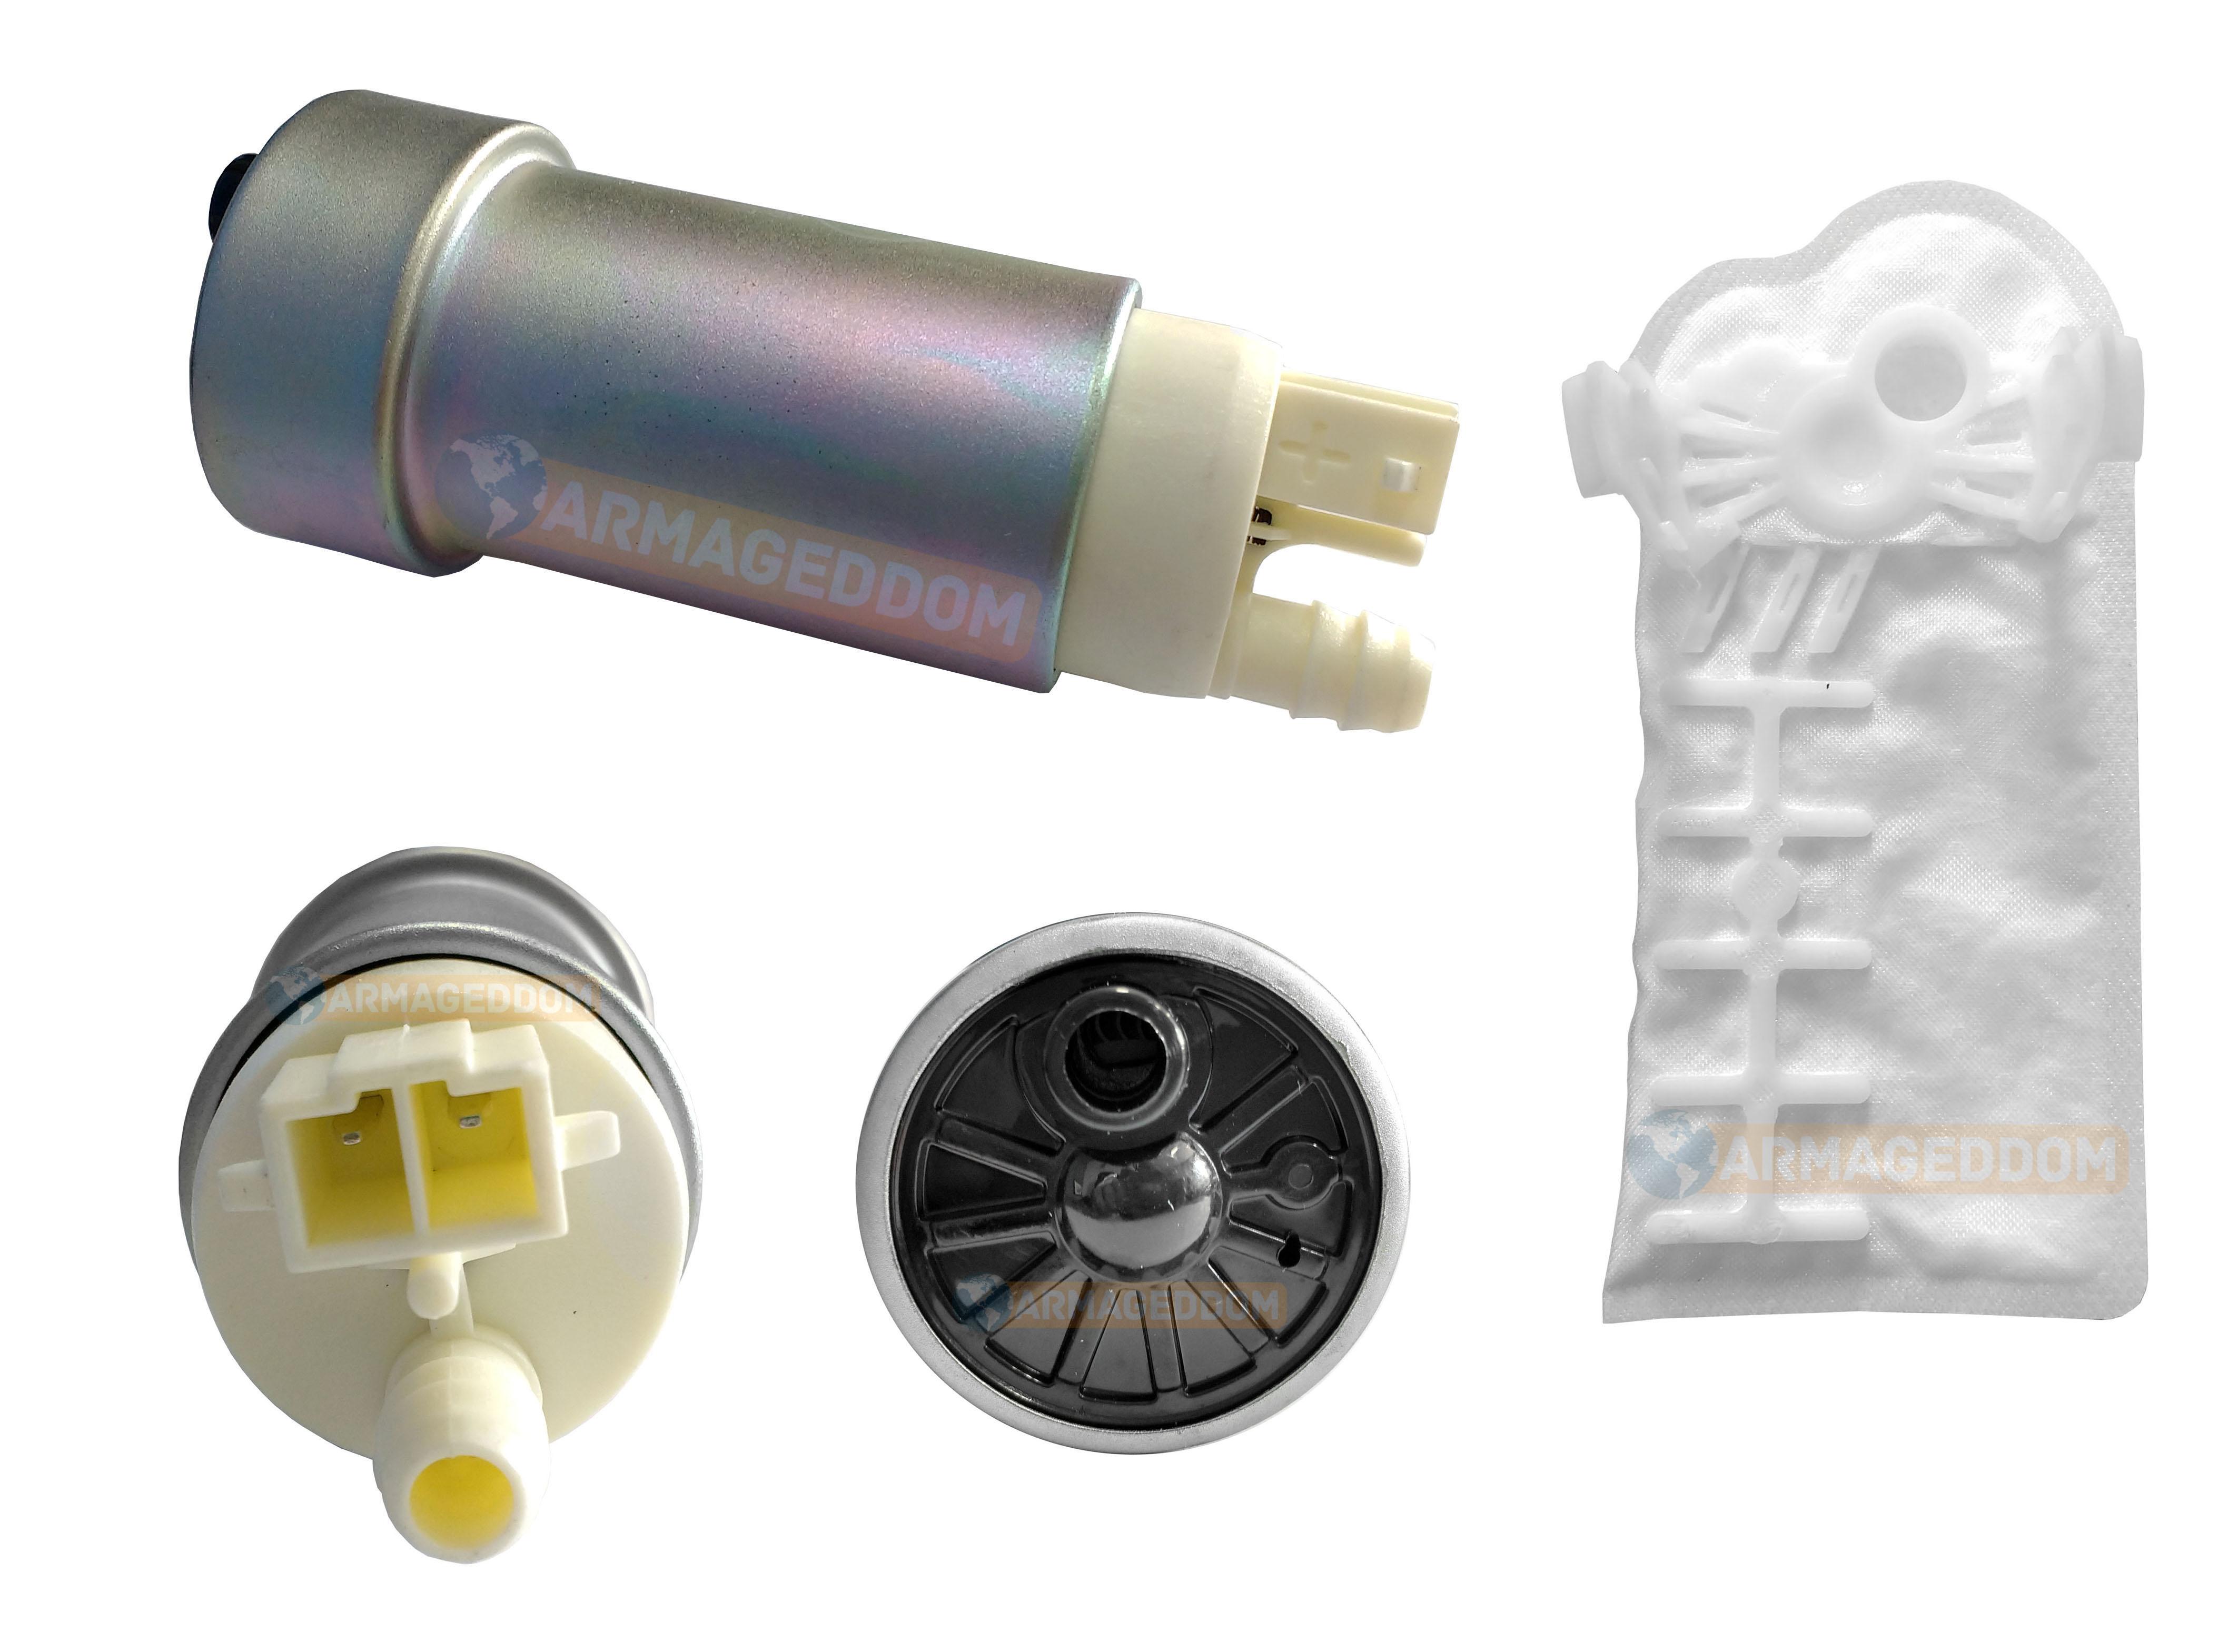 Bomba Combustivel Mercedes C180 C200 C220 C280 Clk200 Sl280